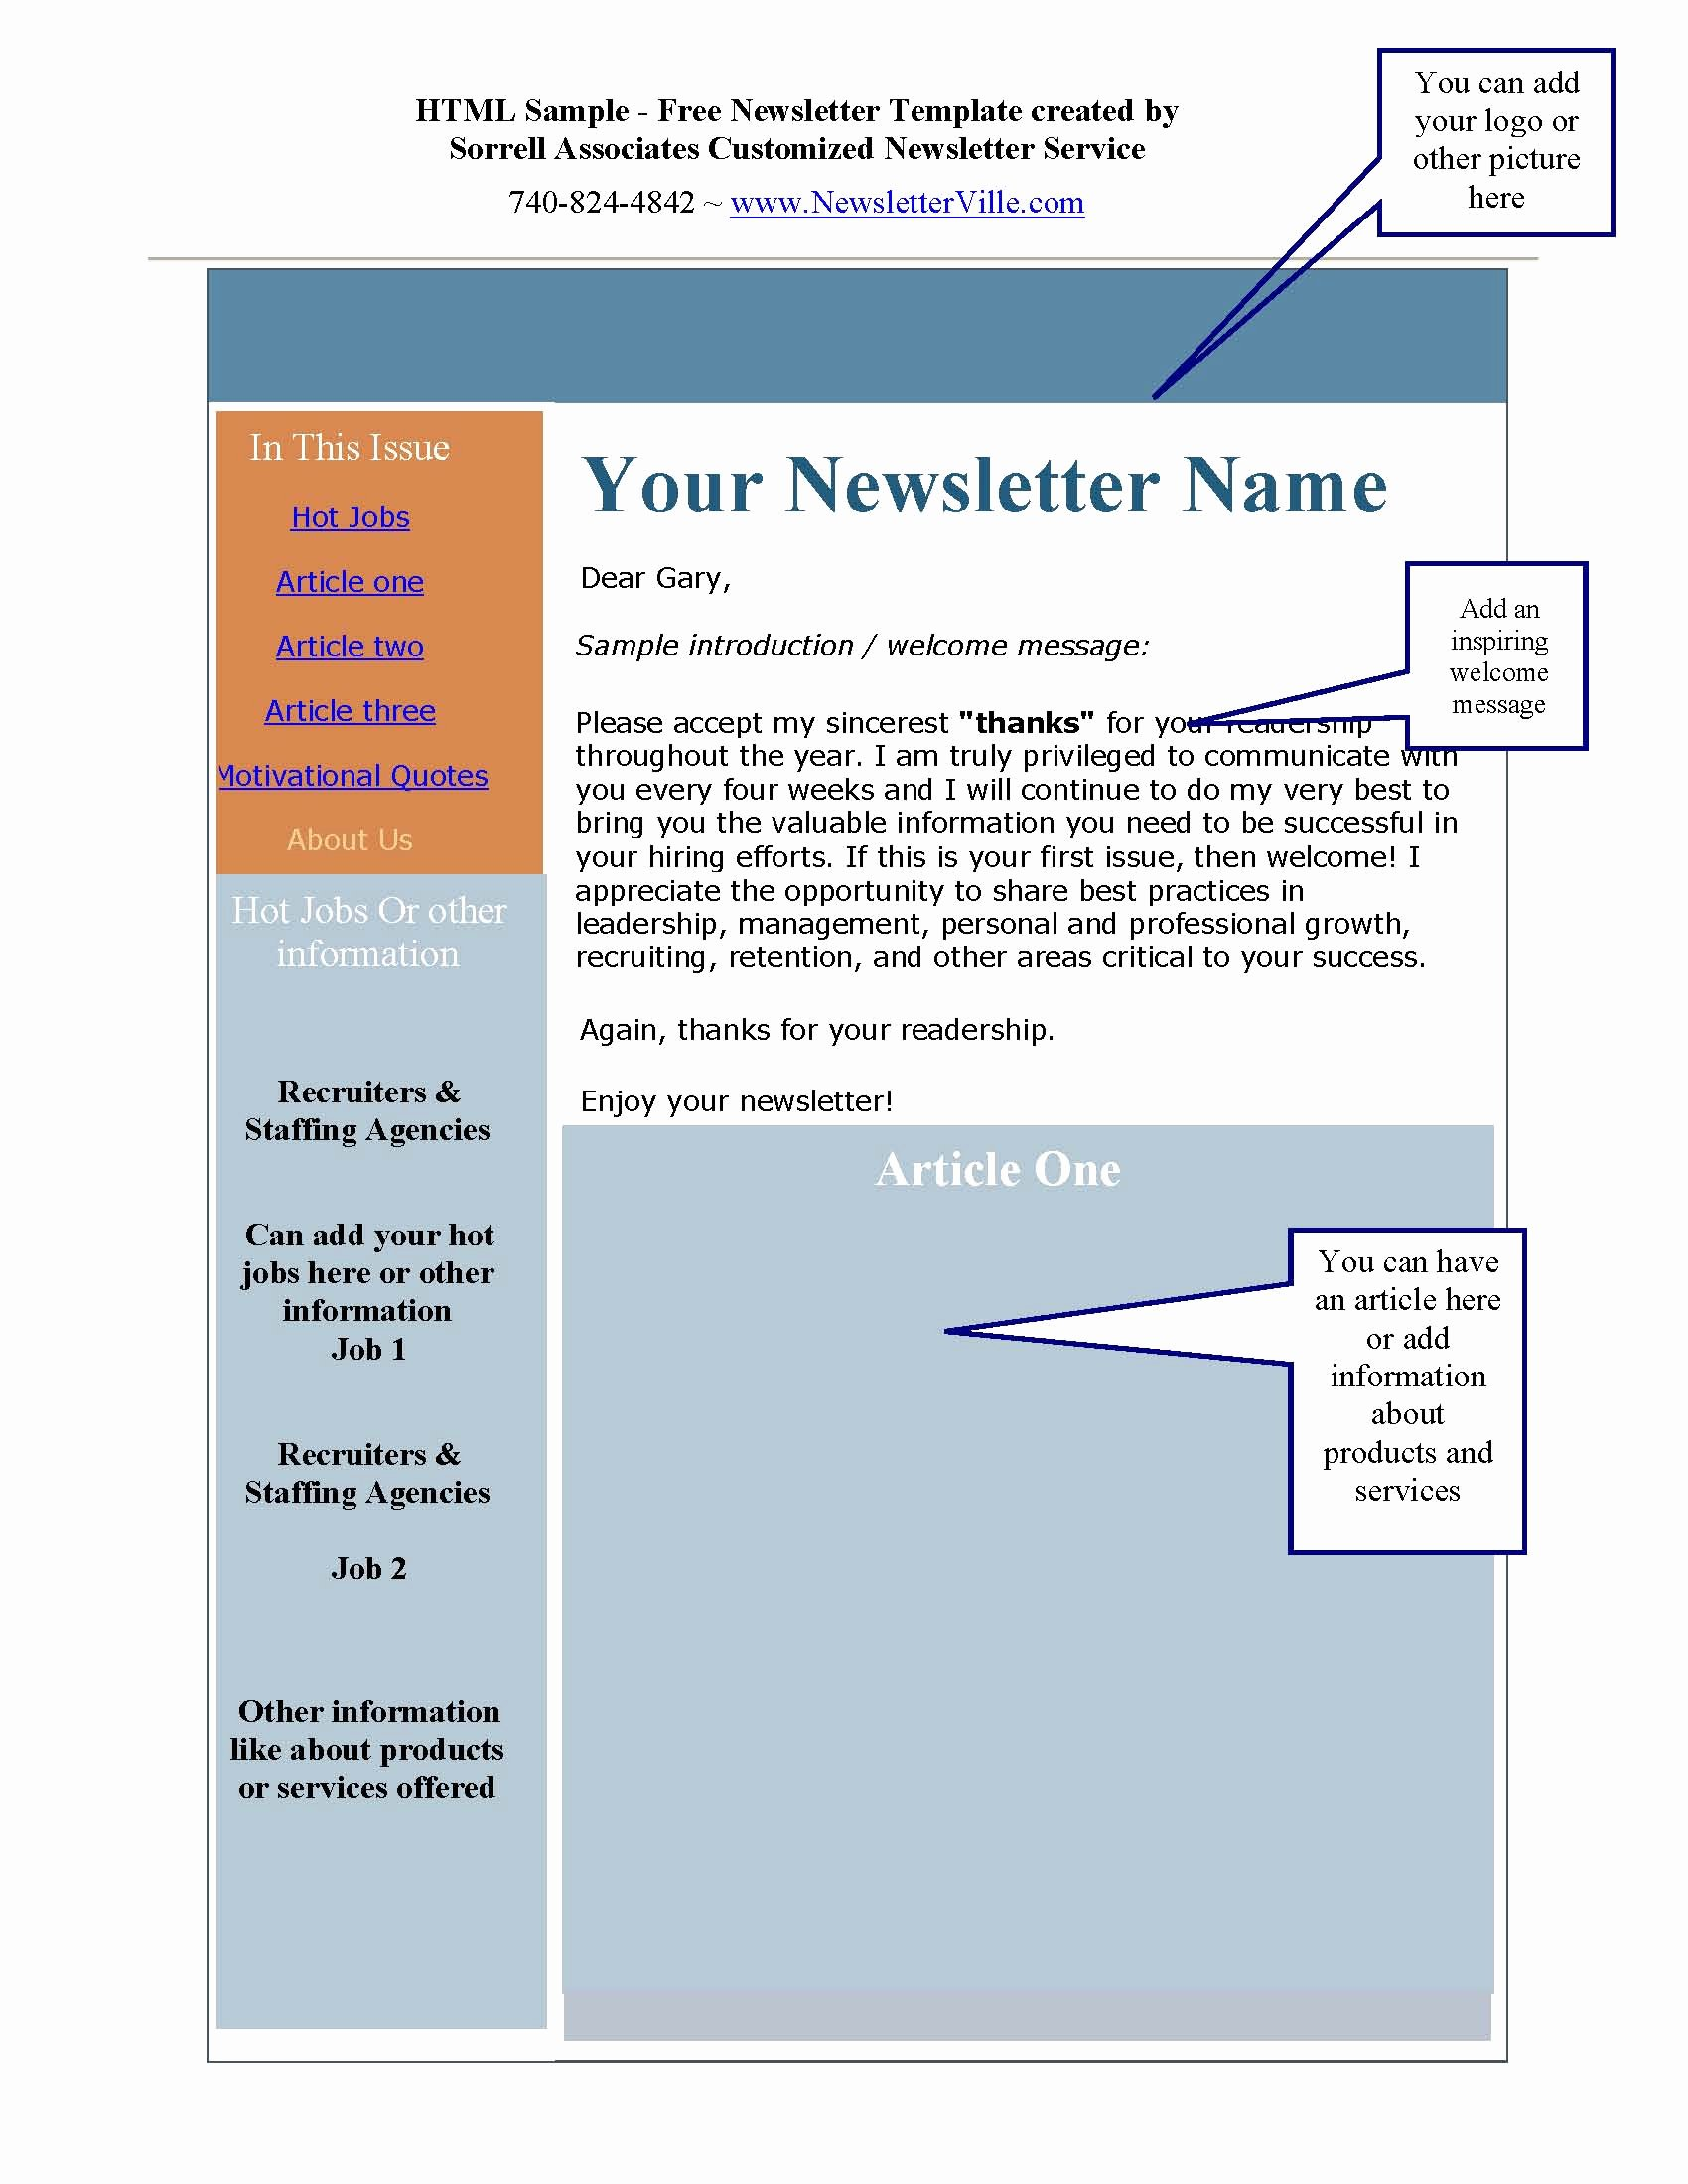 Free Printable Newsletter Templates Inspirational Newsletter & Blog Articles Provided Plus Free Newsletter